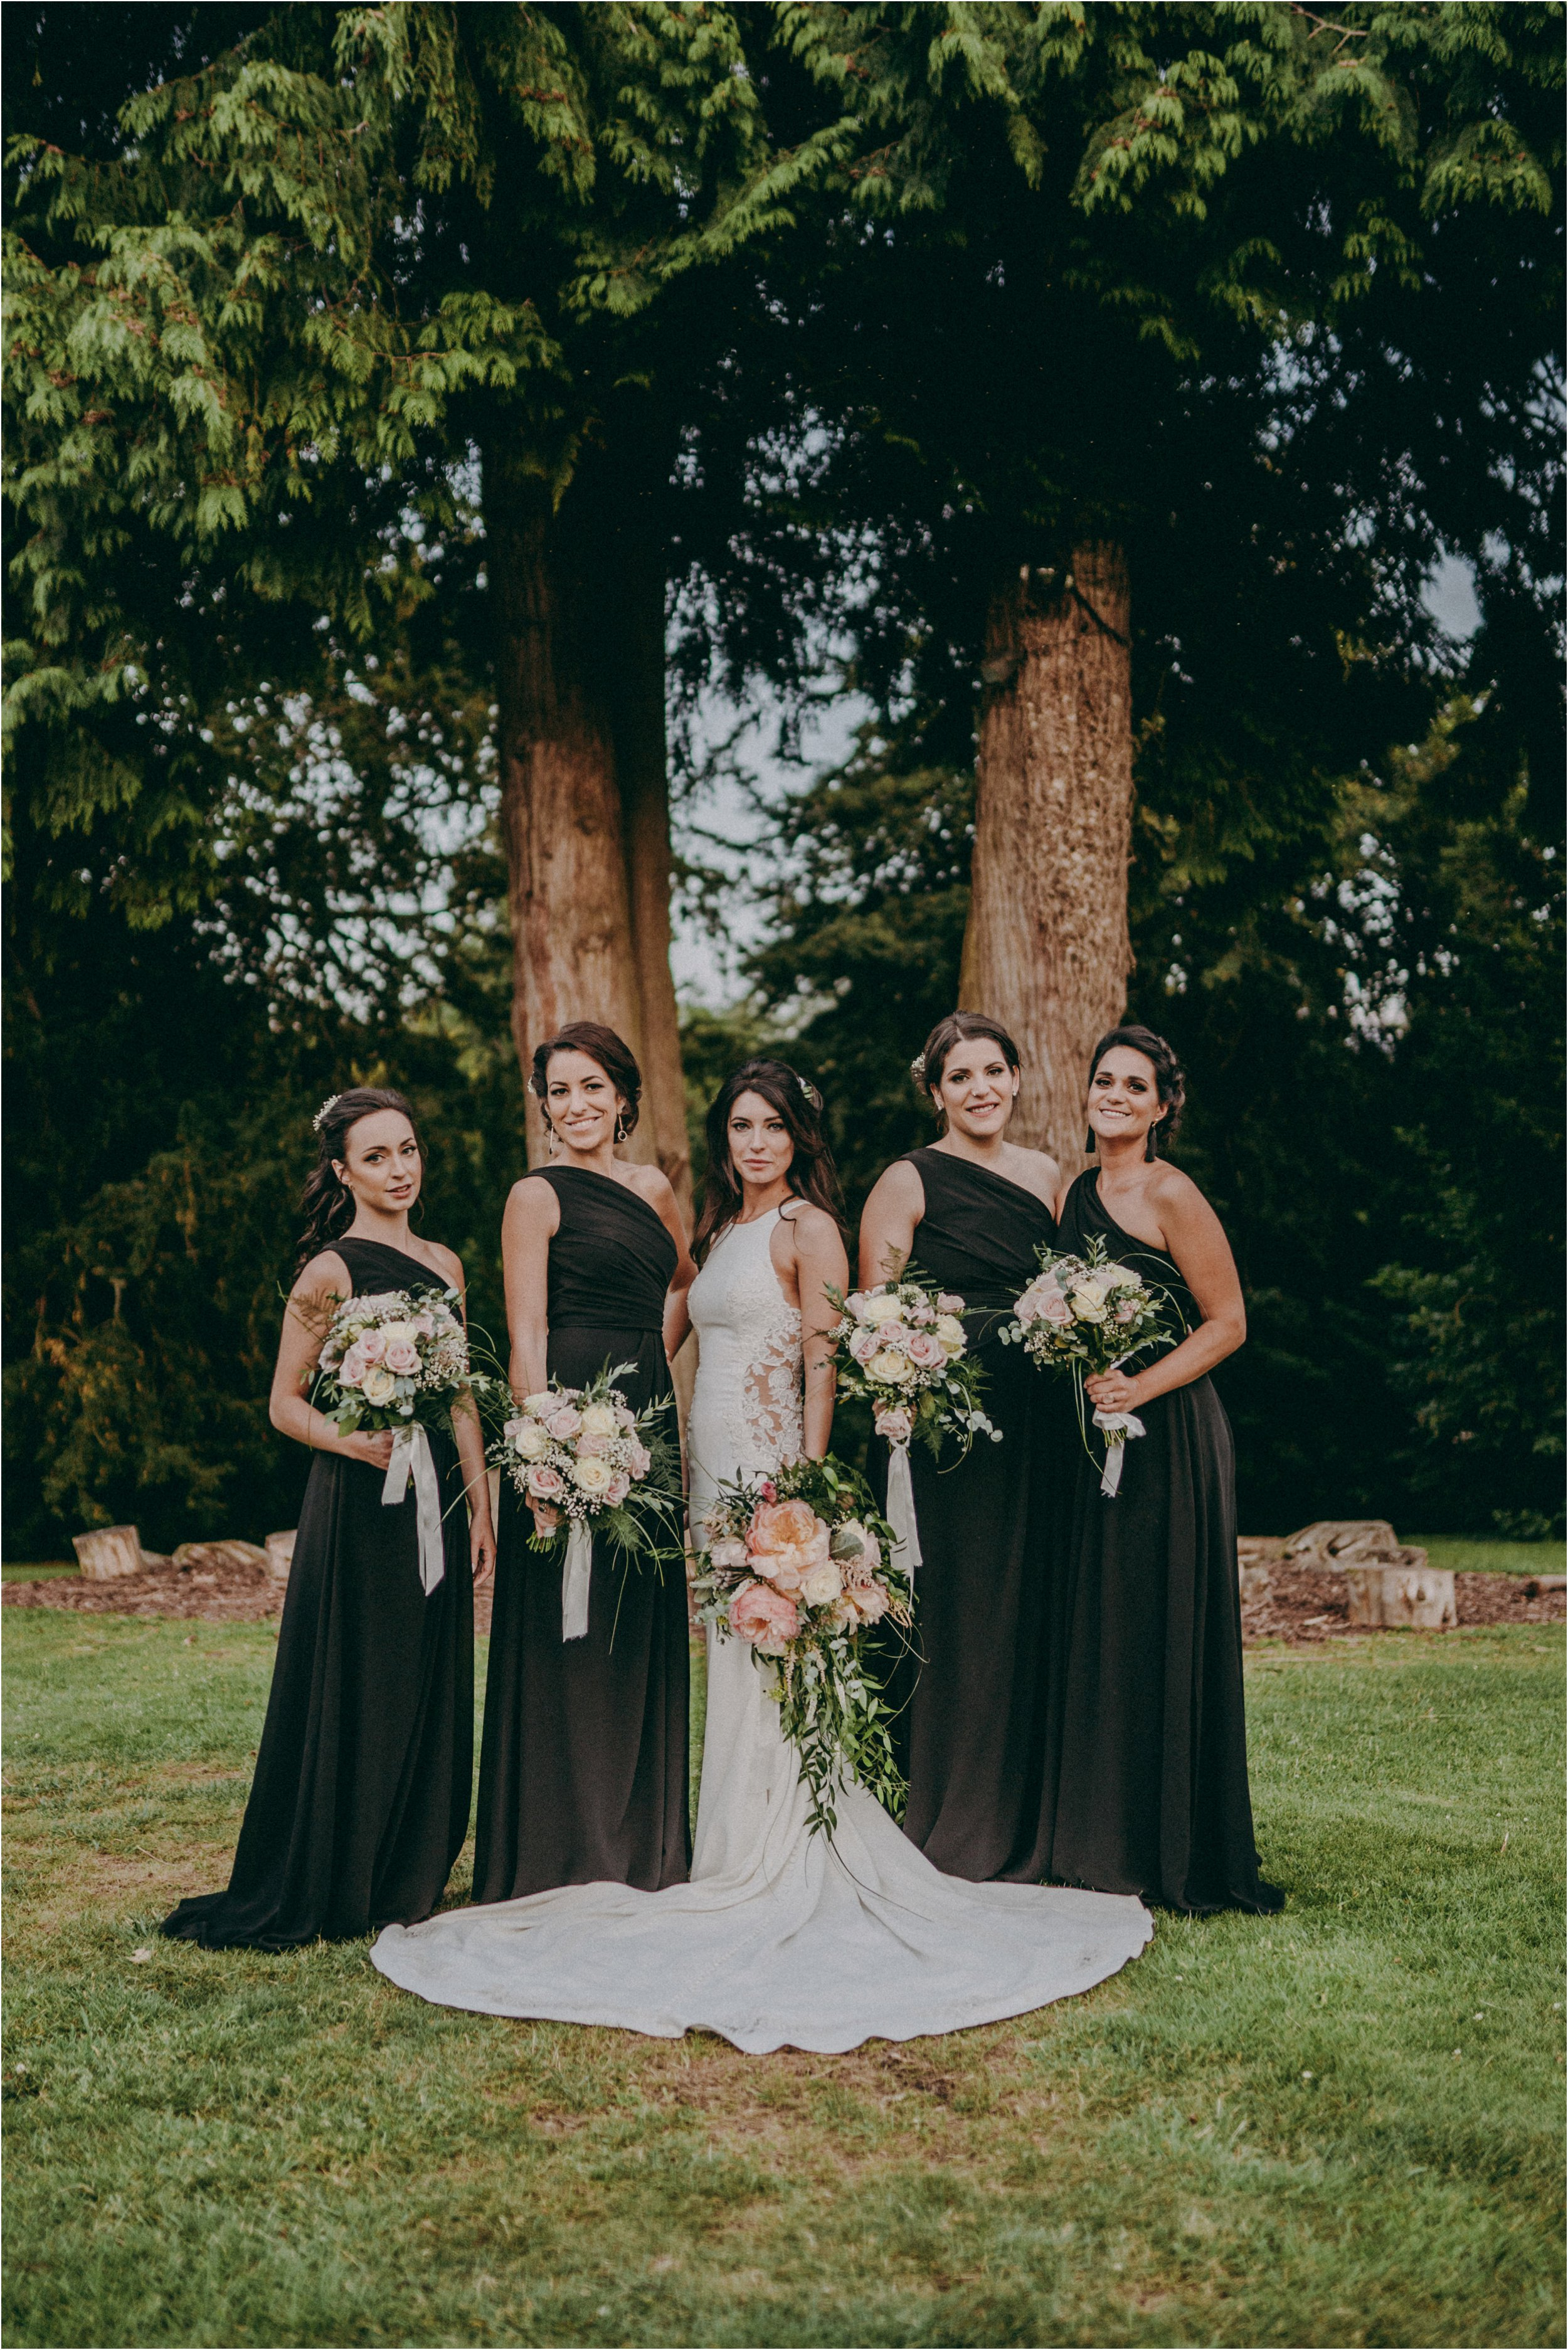 Compton Verney wedding photography_0180.jpg